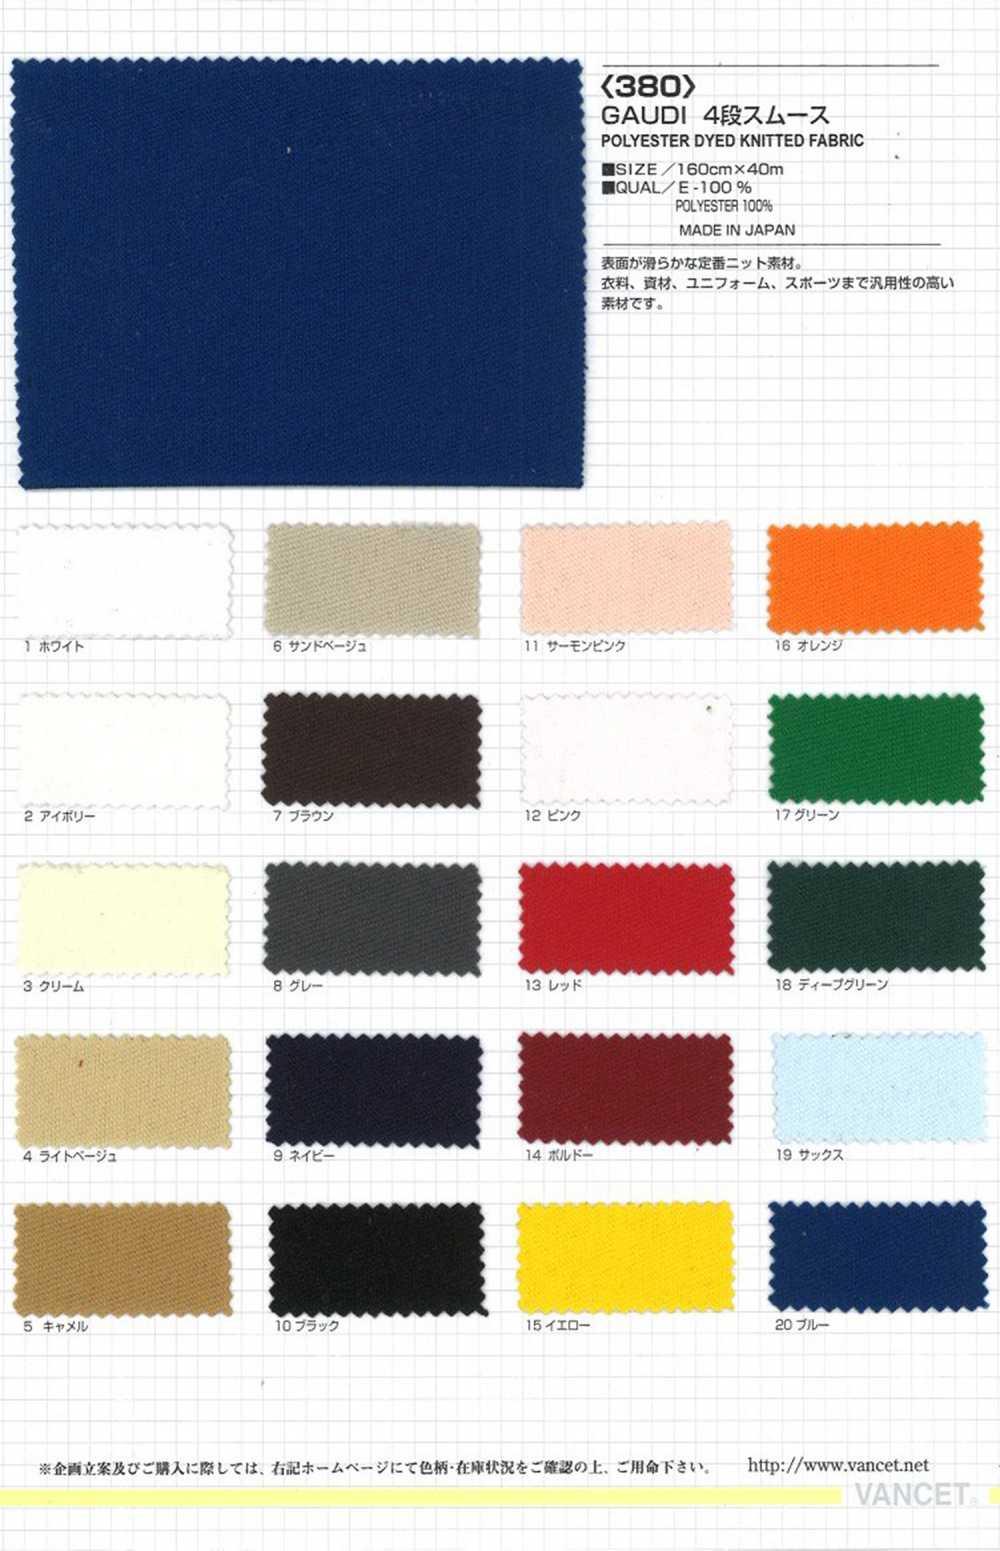 380 GAUDI 4段スムース[生地] VANCET/オークラ商事 - ApparelX アパレル資材卸通販